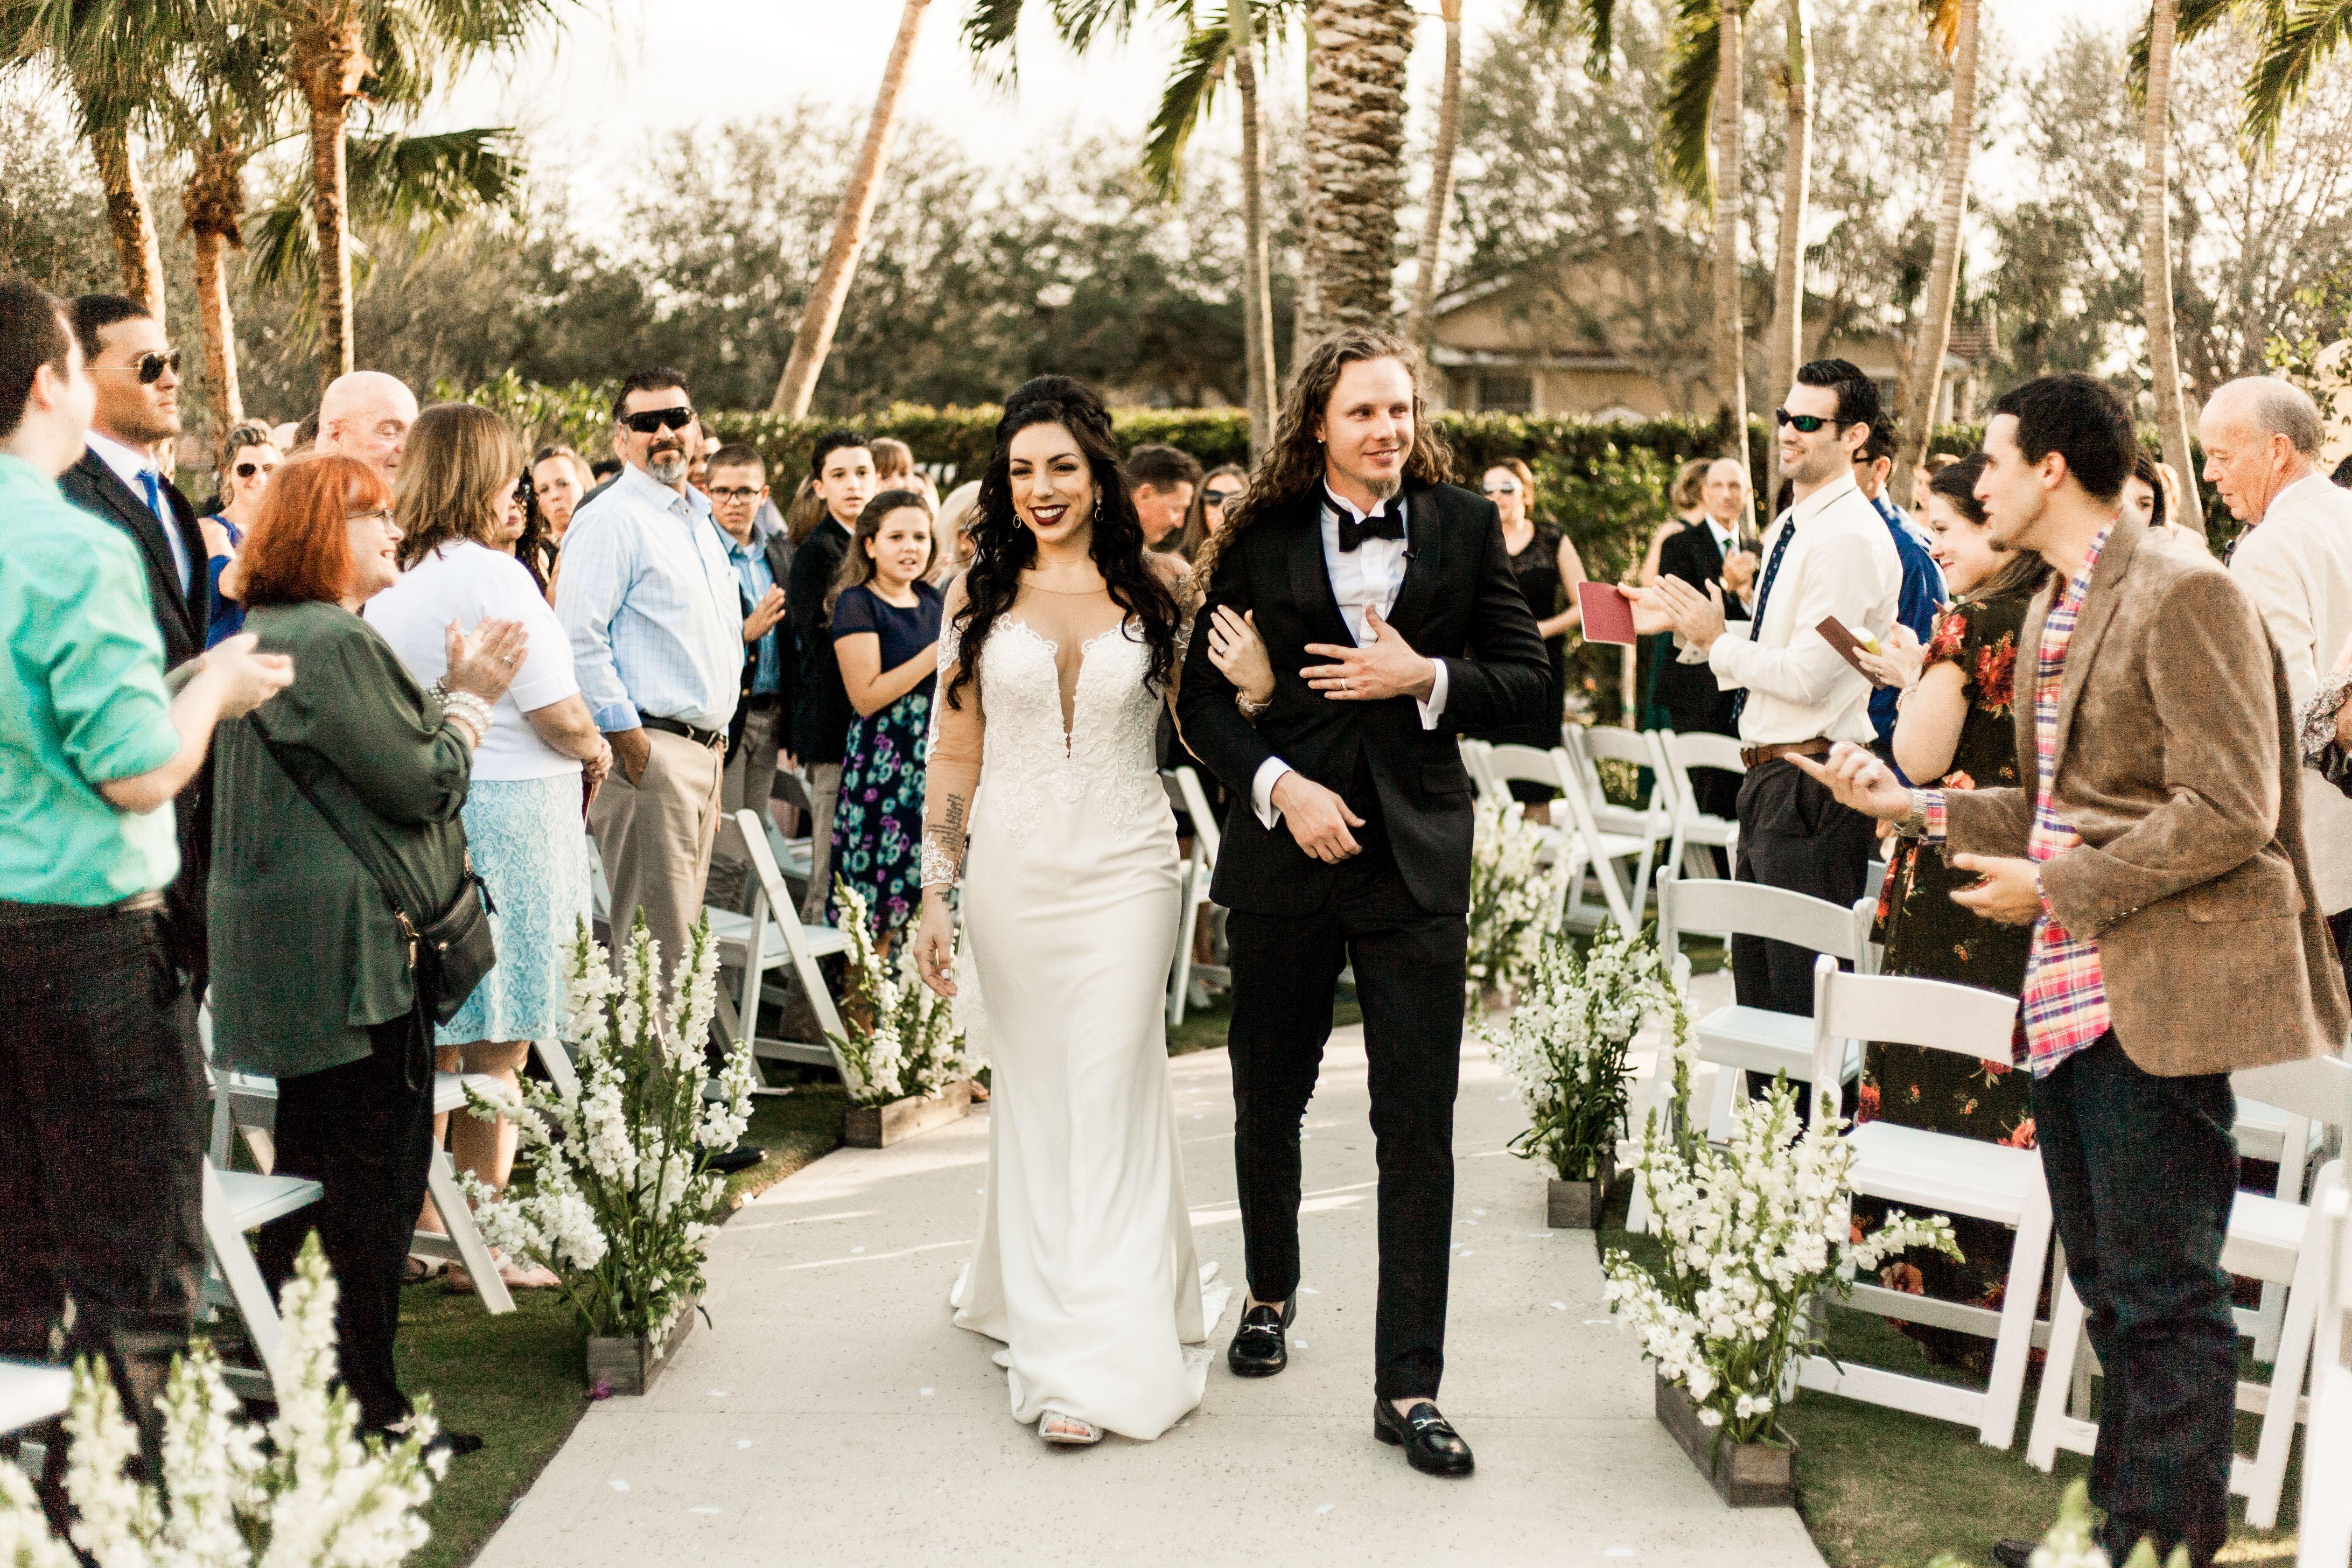 Wedding photographer wedding dress wedding ideas wedding decor